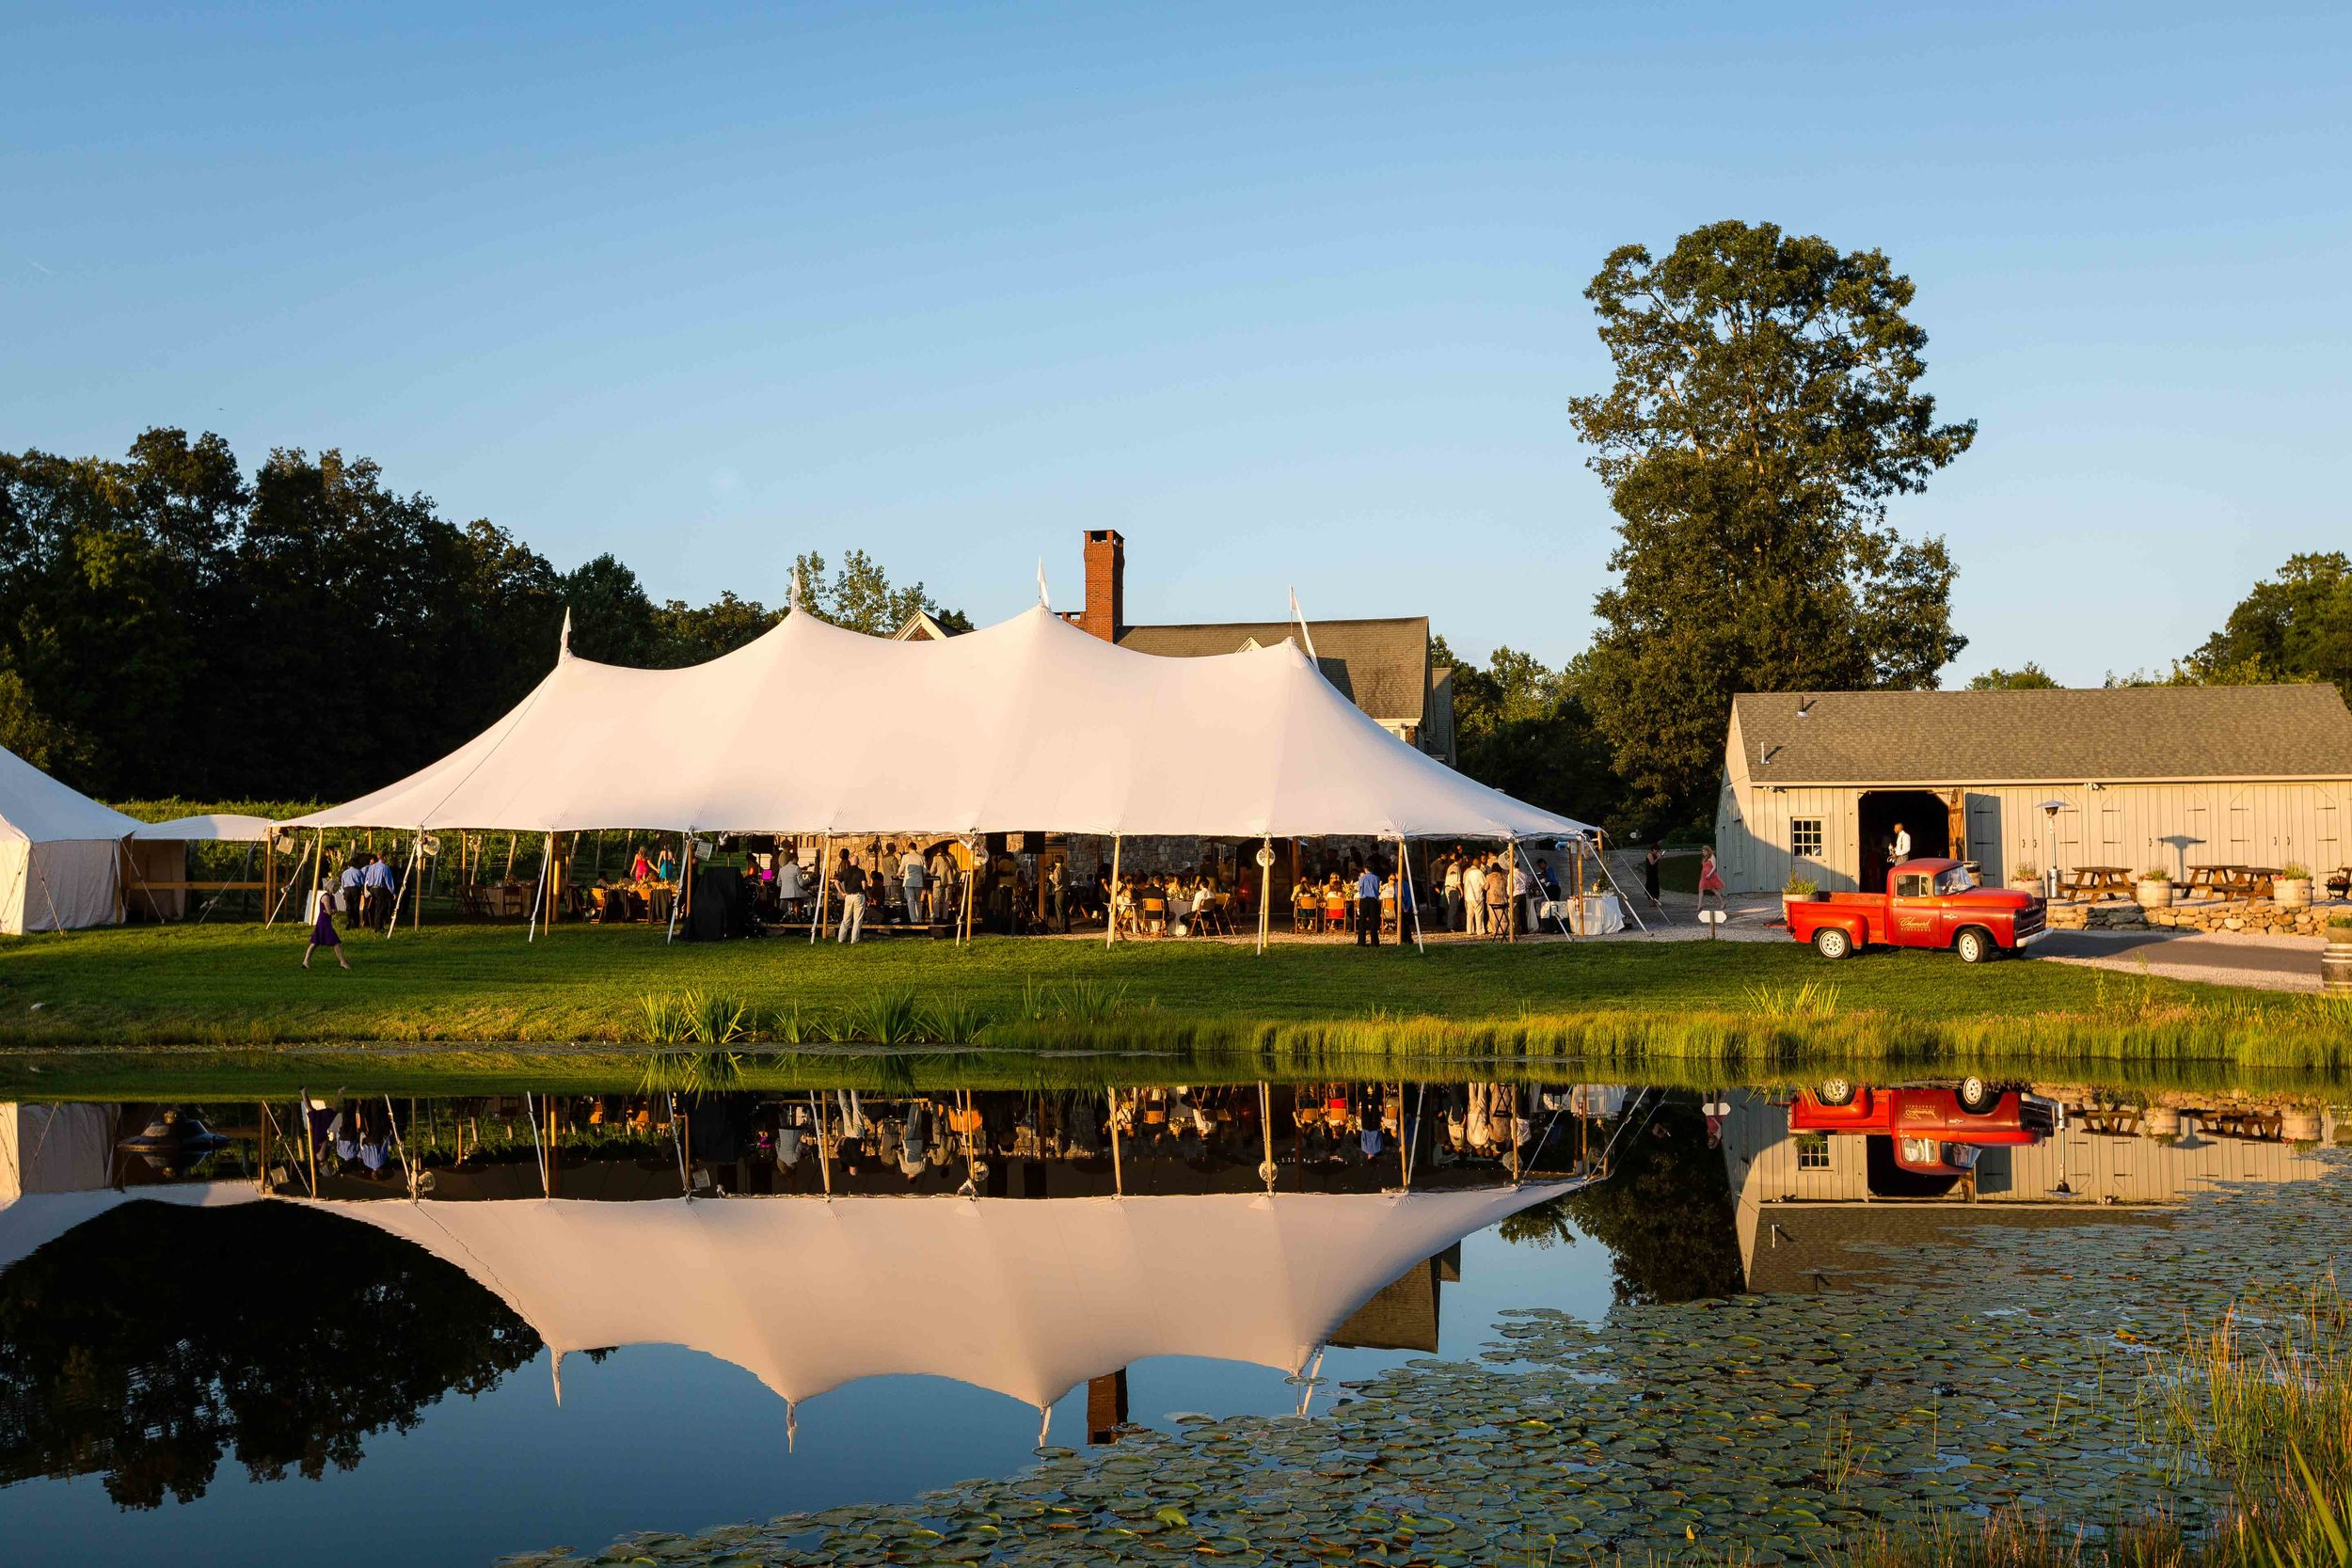 Chamard-Vineyards-Romantic-Wedding-Connecticut-Photojournalistic-Photography-Jacek-Dolata-12.jpg